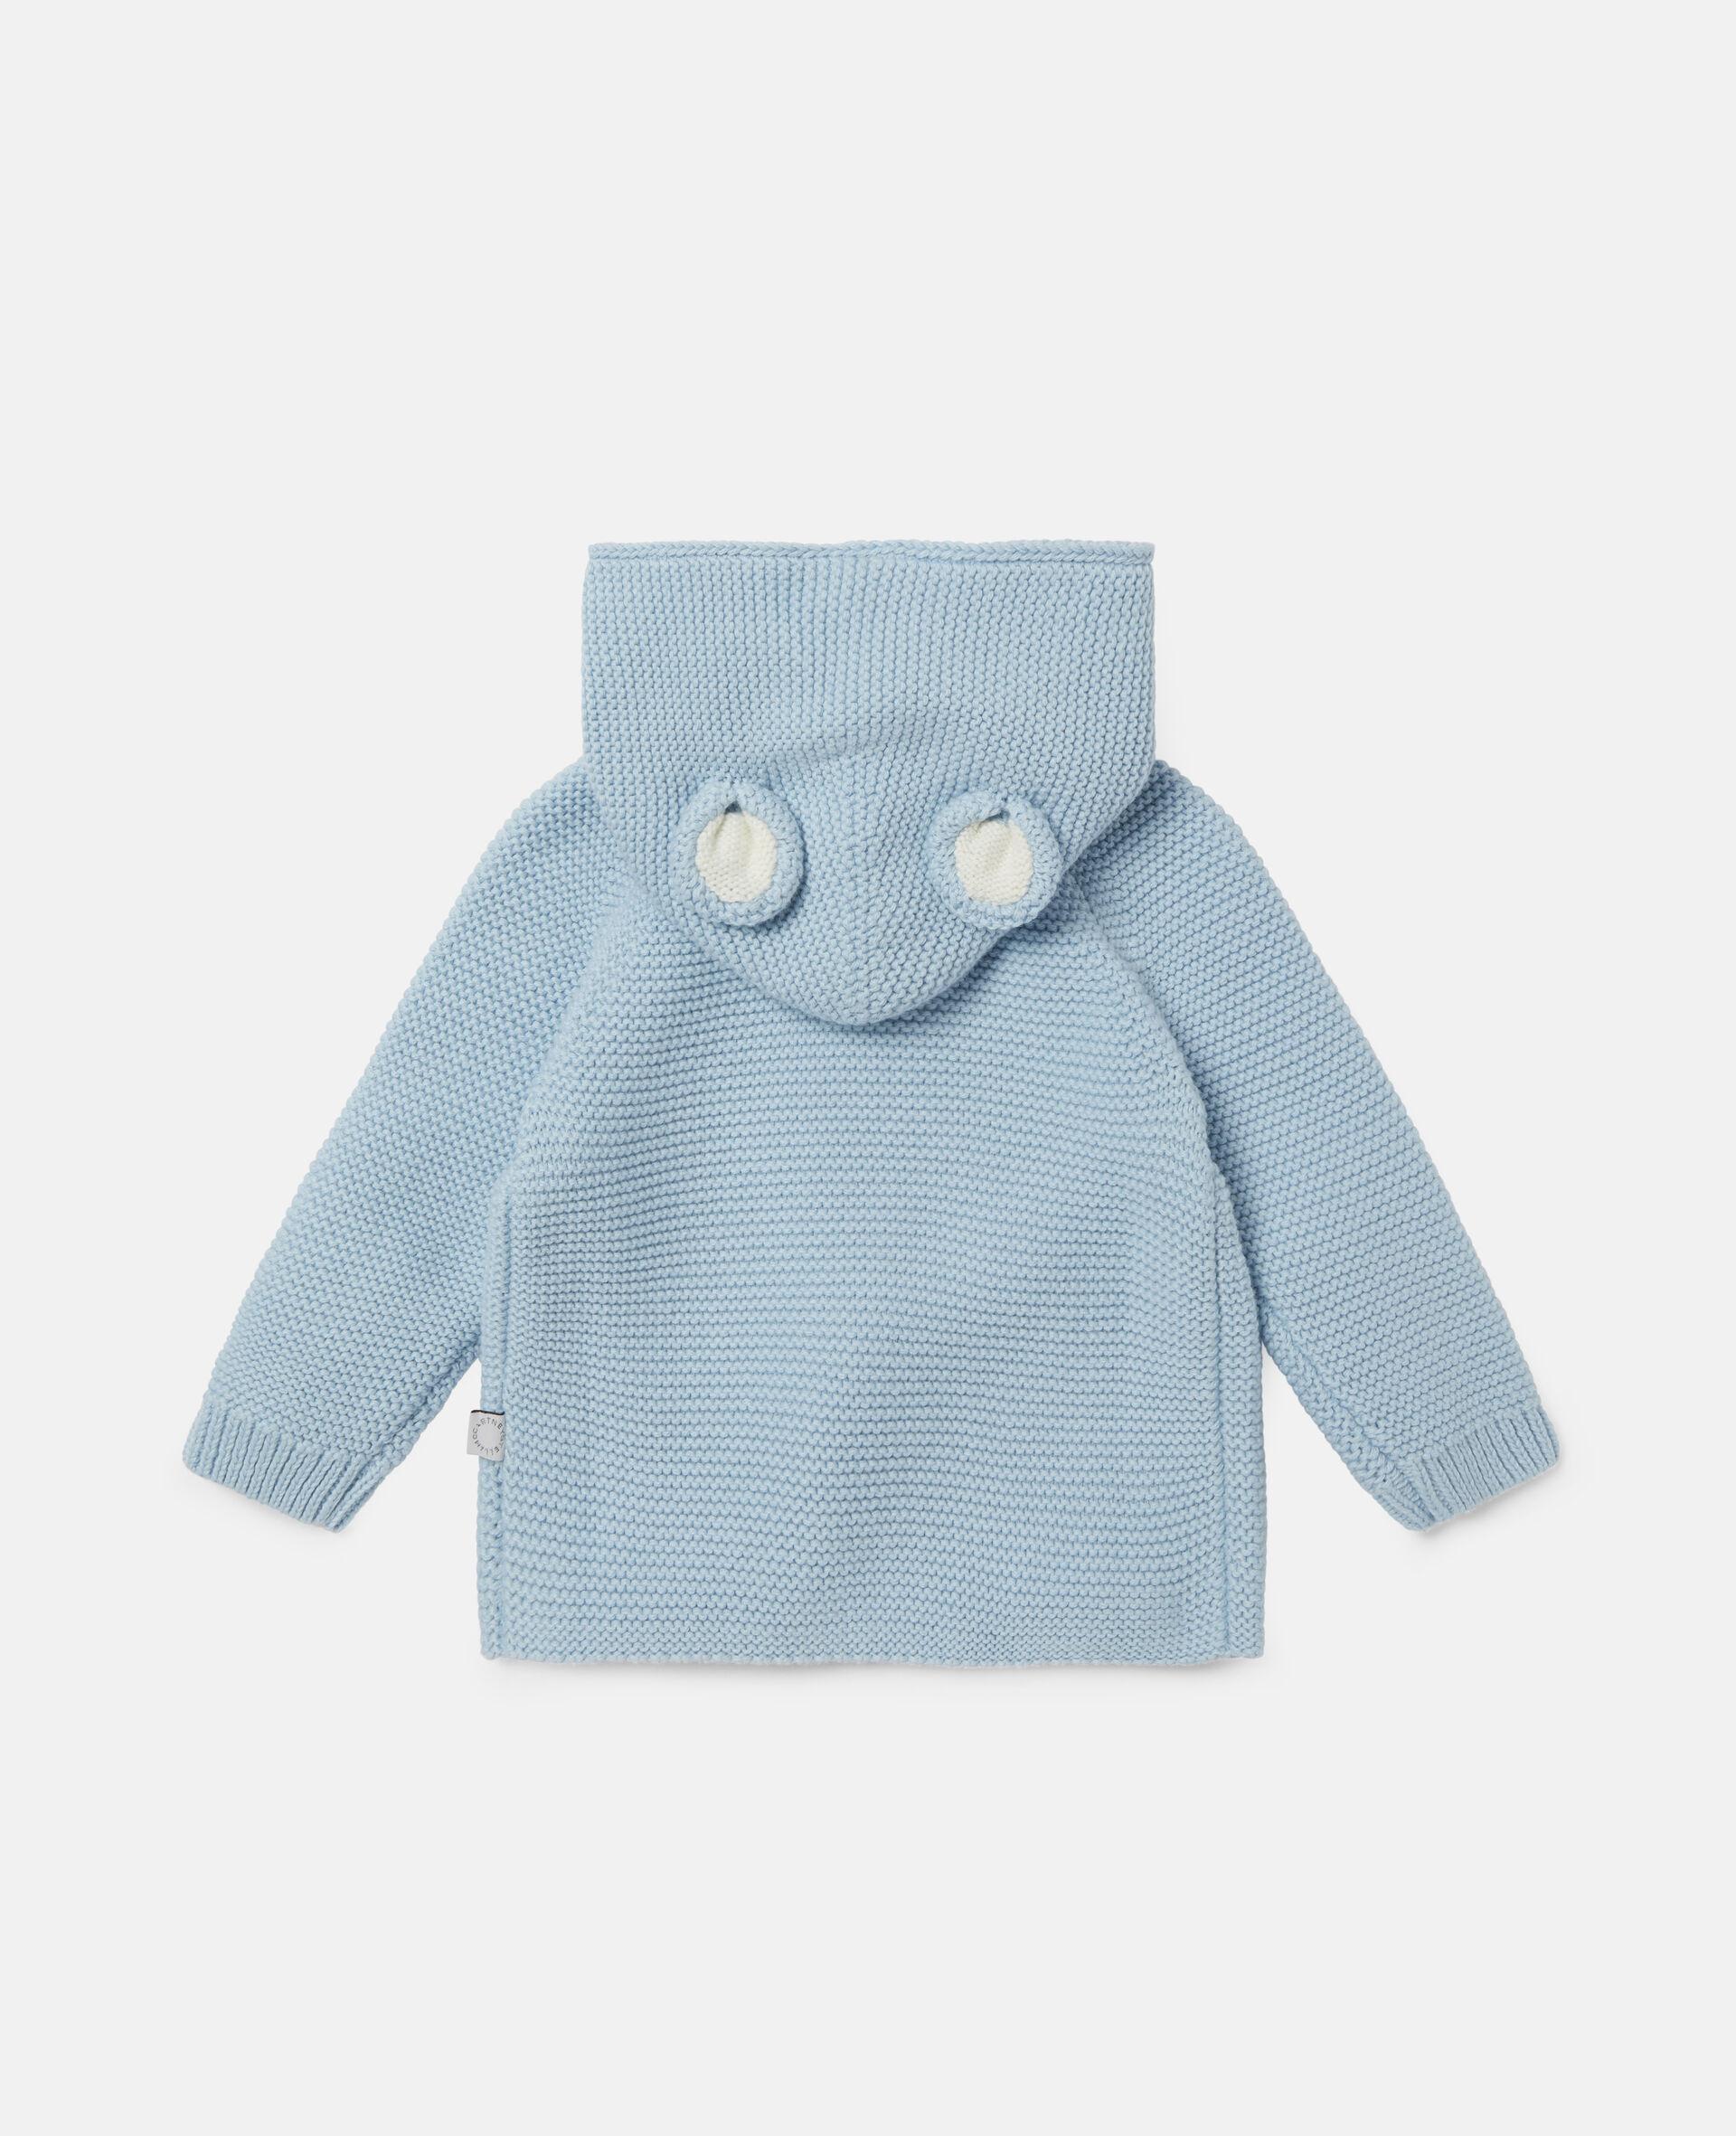 Doggie Knit Cardigan-Blue-large image number 3